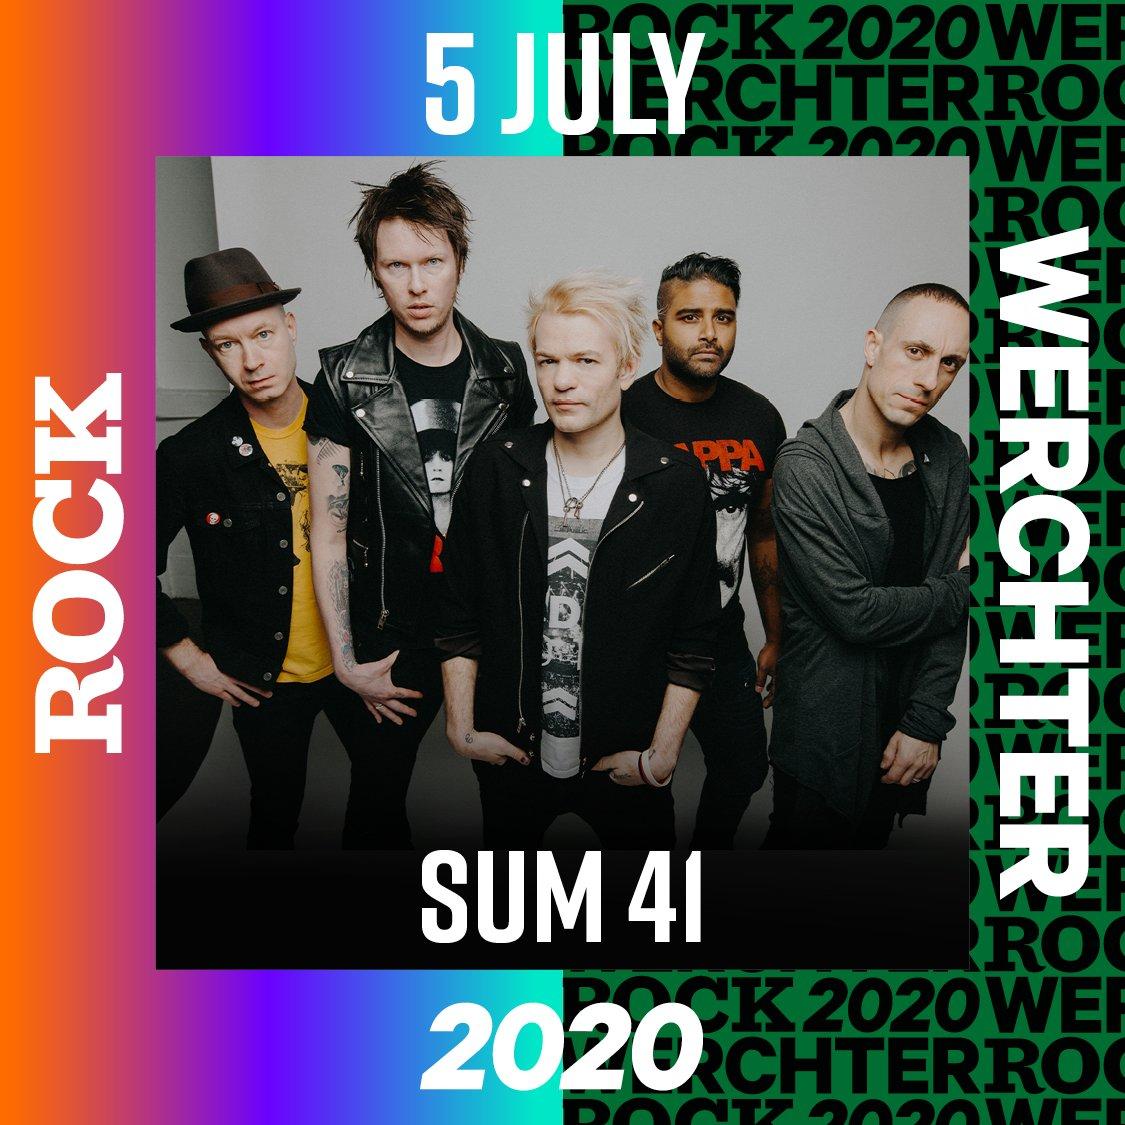 Werchter rock 2020